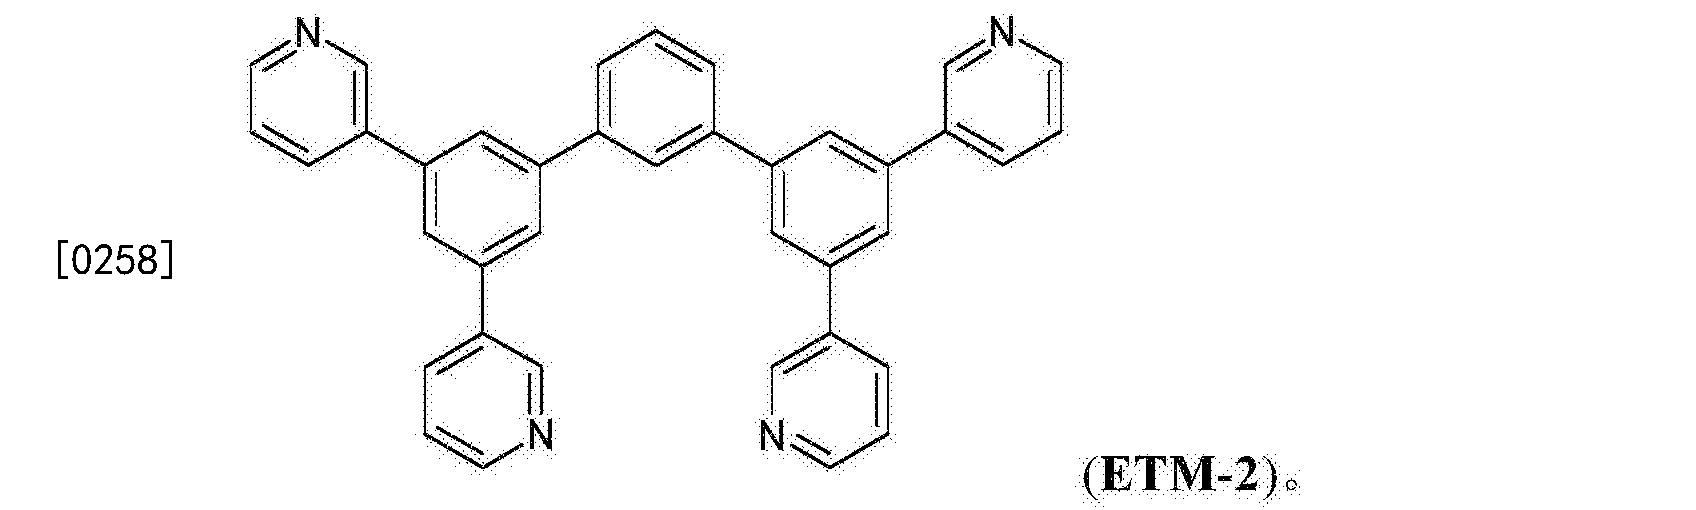 Figure CN107735880AD00524